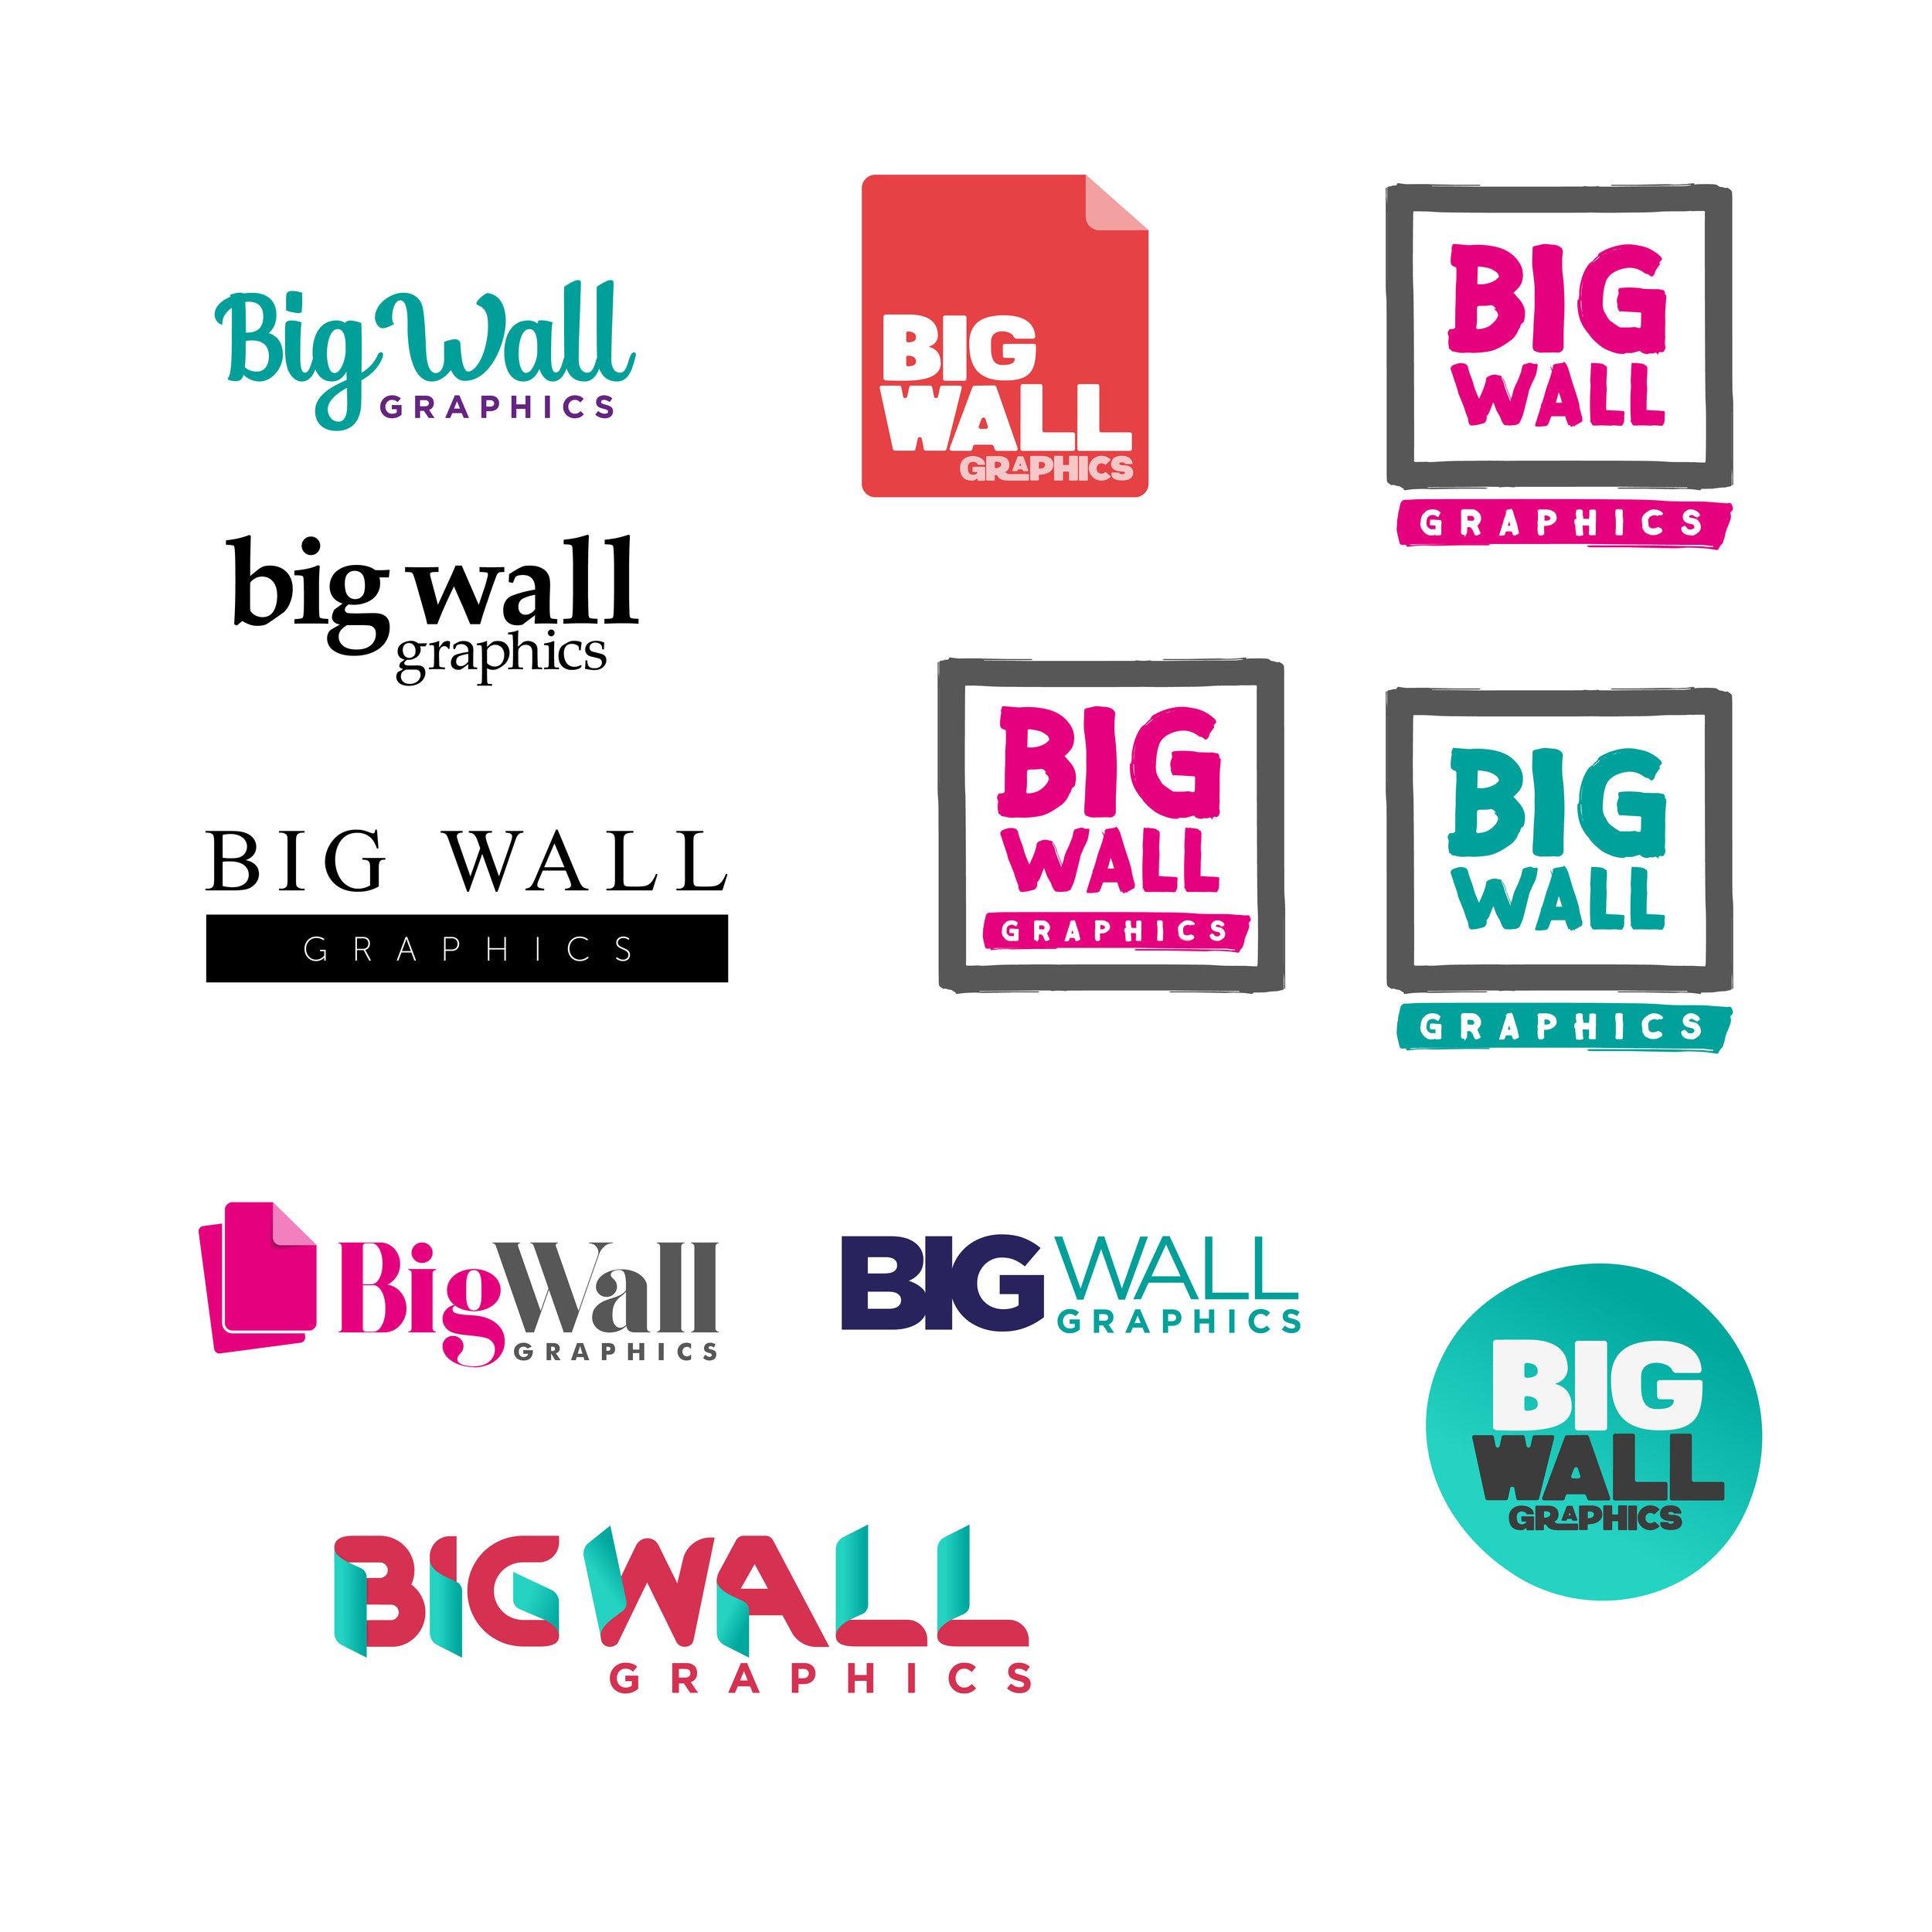 Big Wall Graphics Logos.jpg